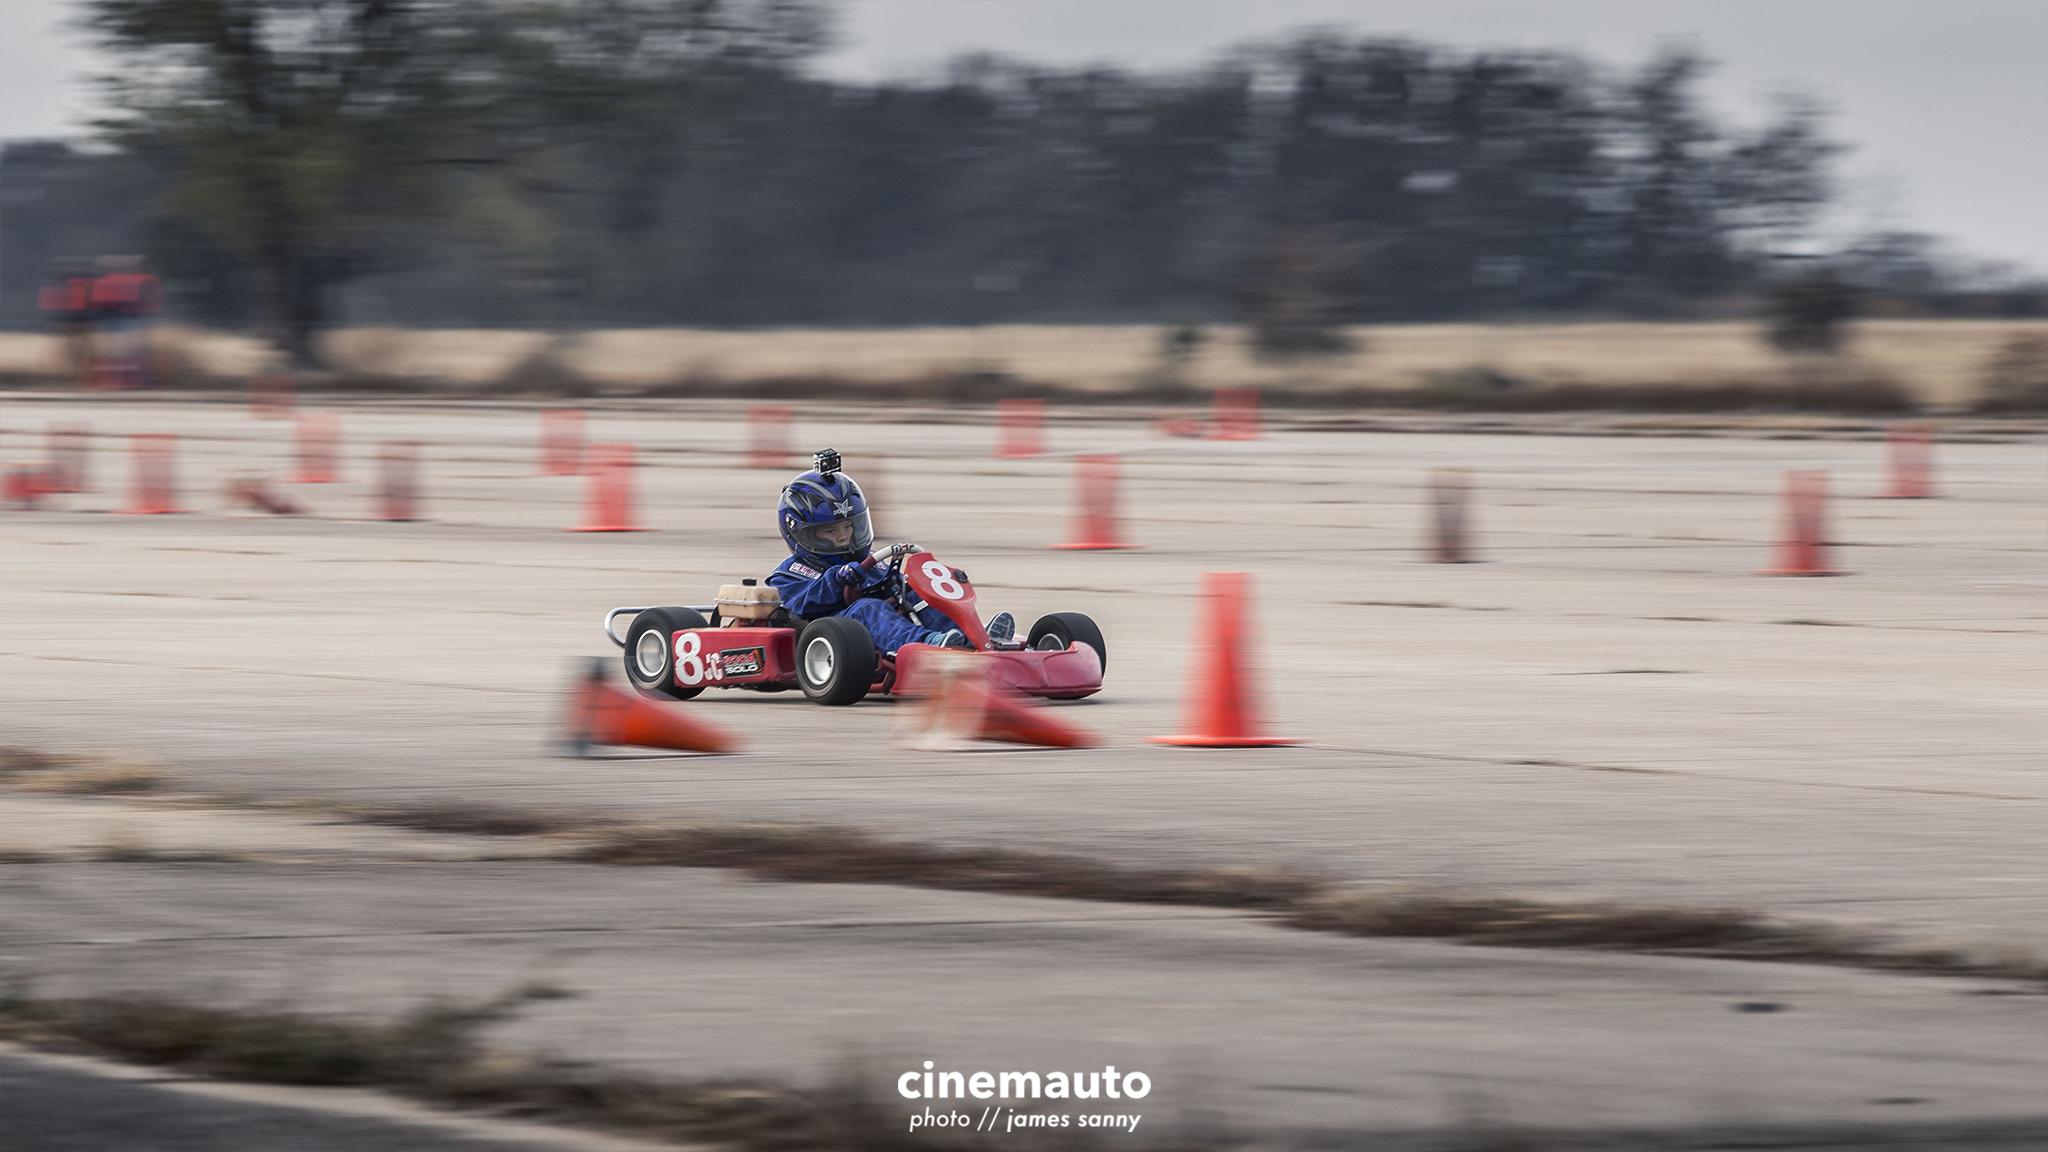 wichita-automotive-photographer-james-sanny-scca15.jpg